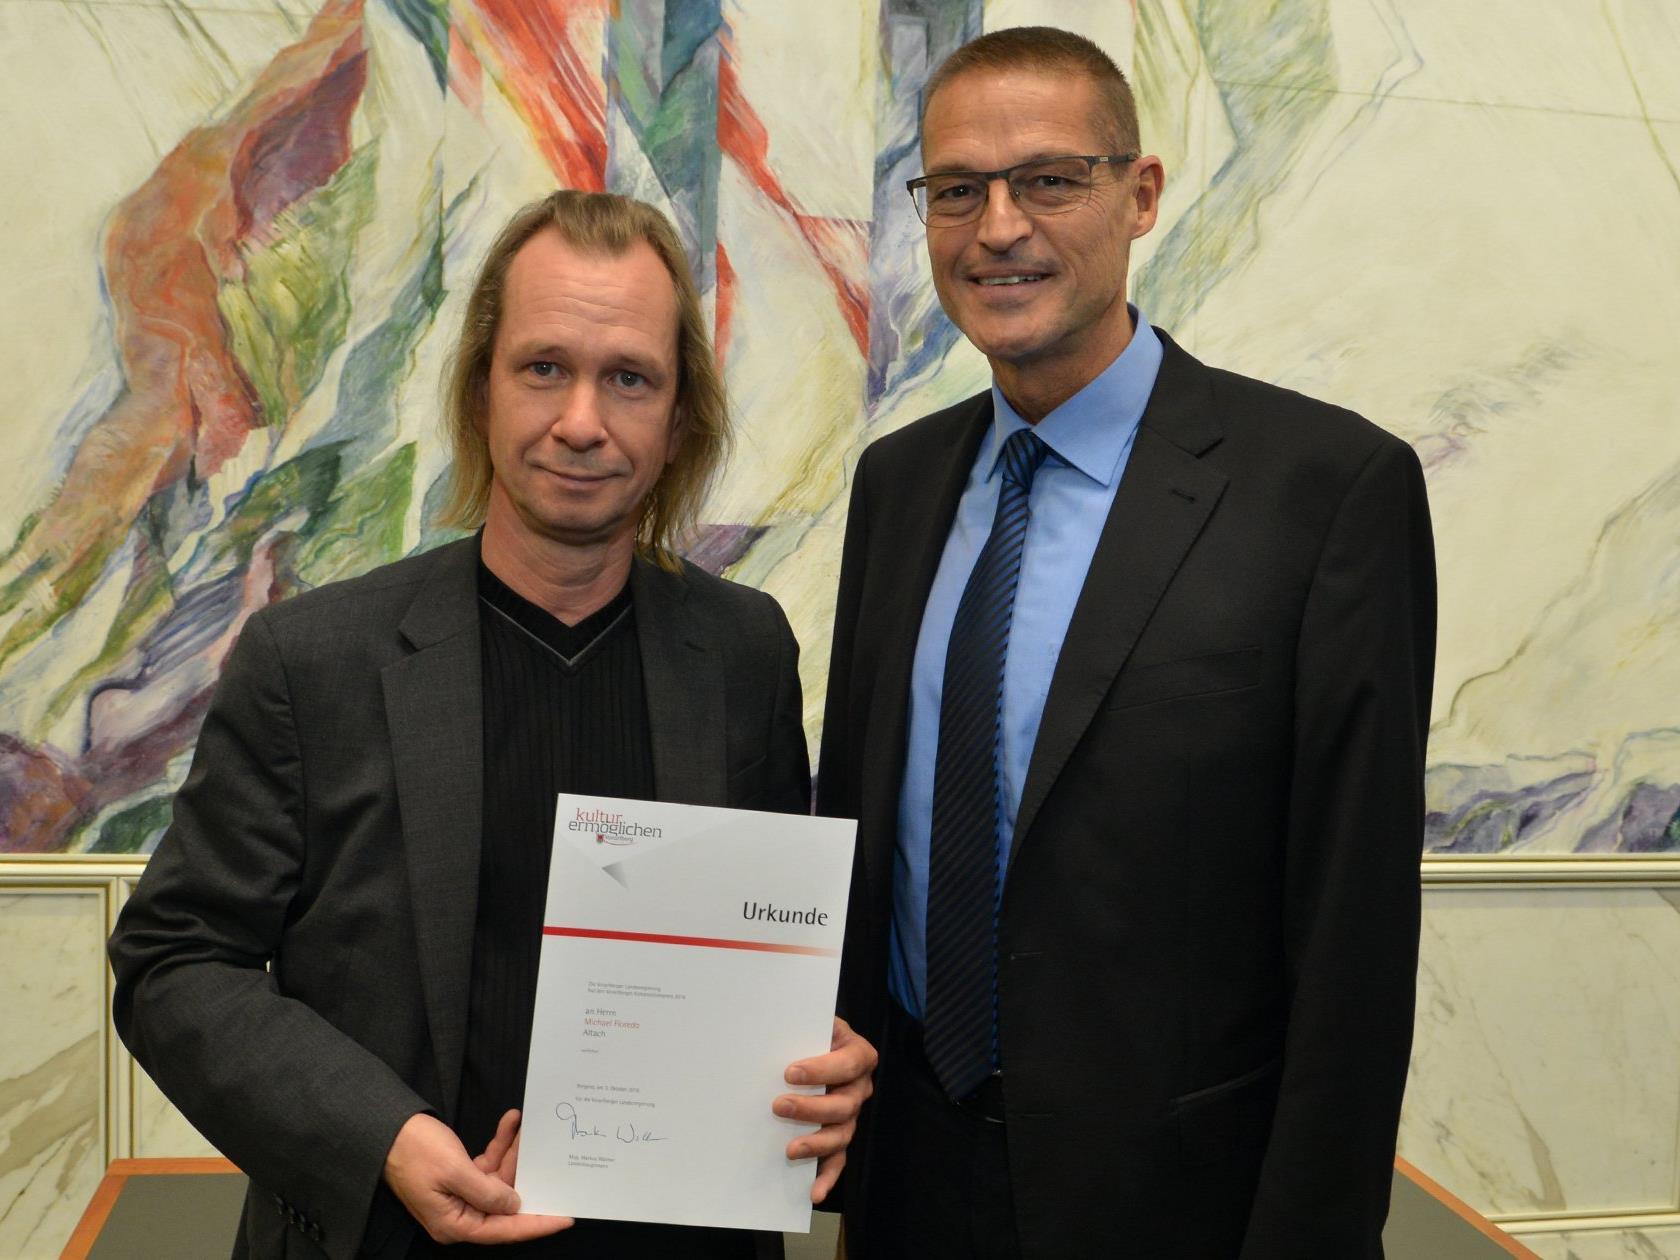 Michael Floredo erhielt den Vorarlberger Kompositionspreis 2016